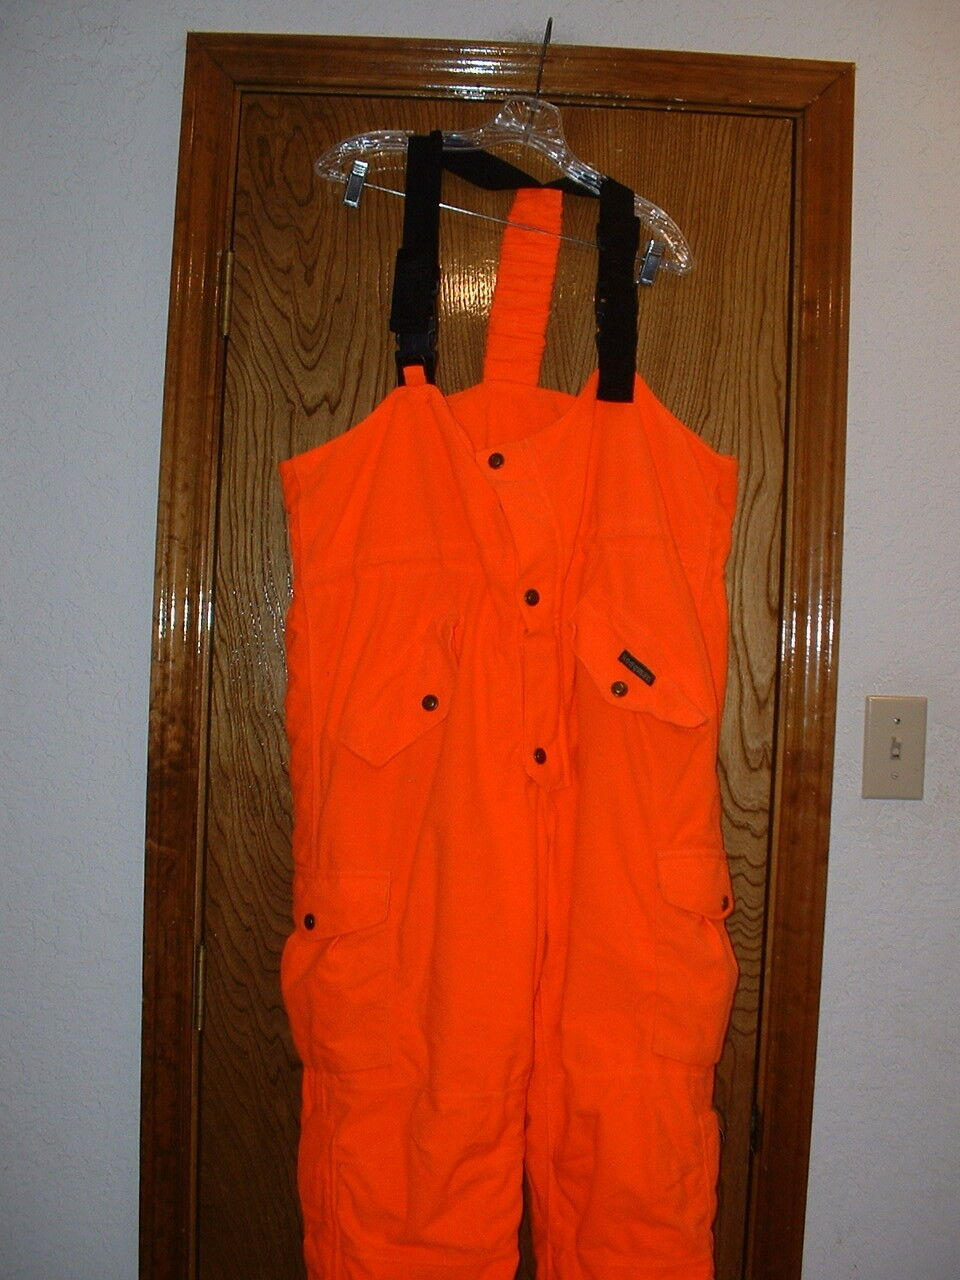 Para Hombres Pantalones Babero Hodgman aislado Blaze Naranja XL